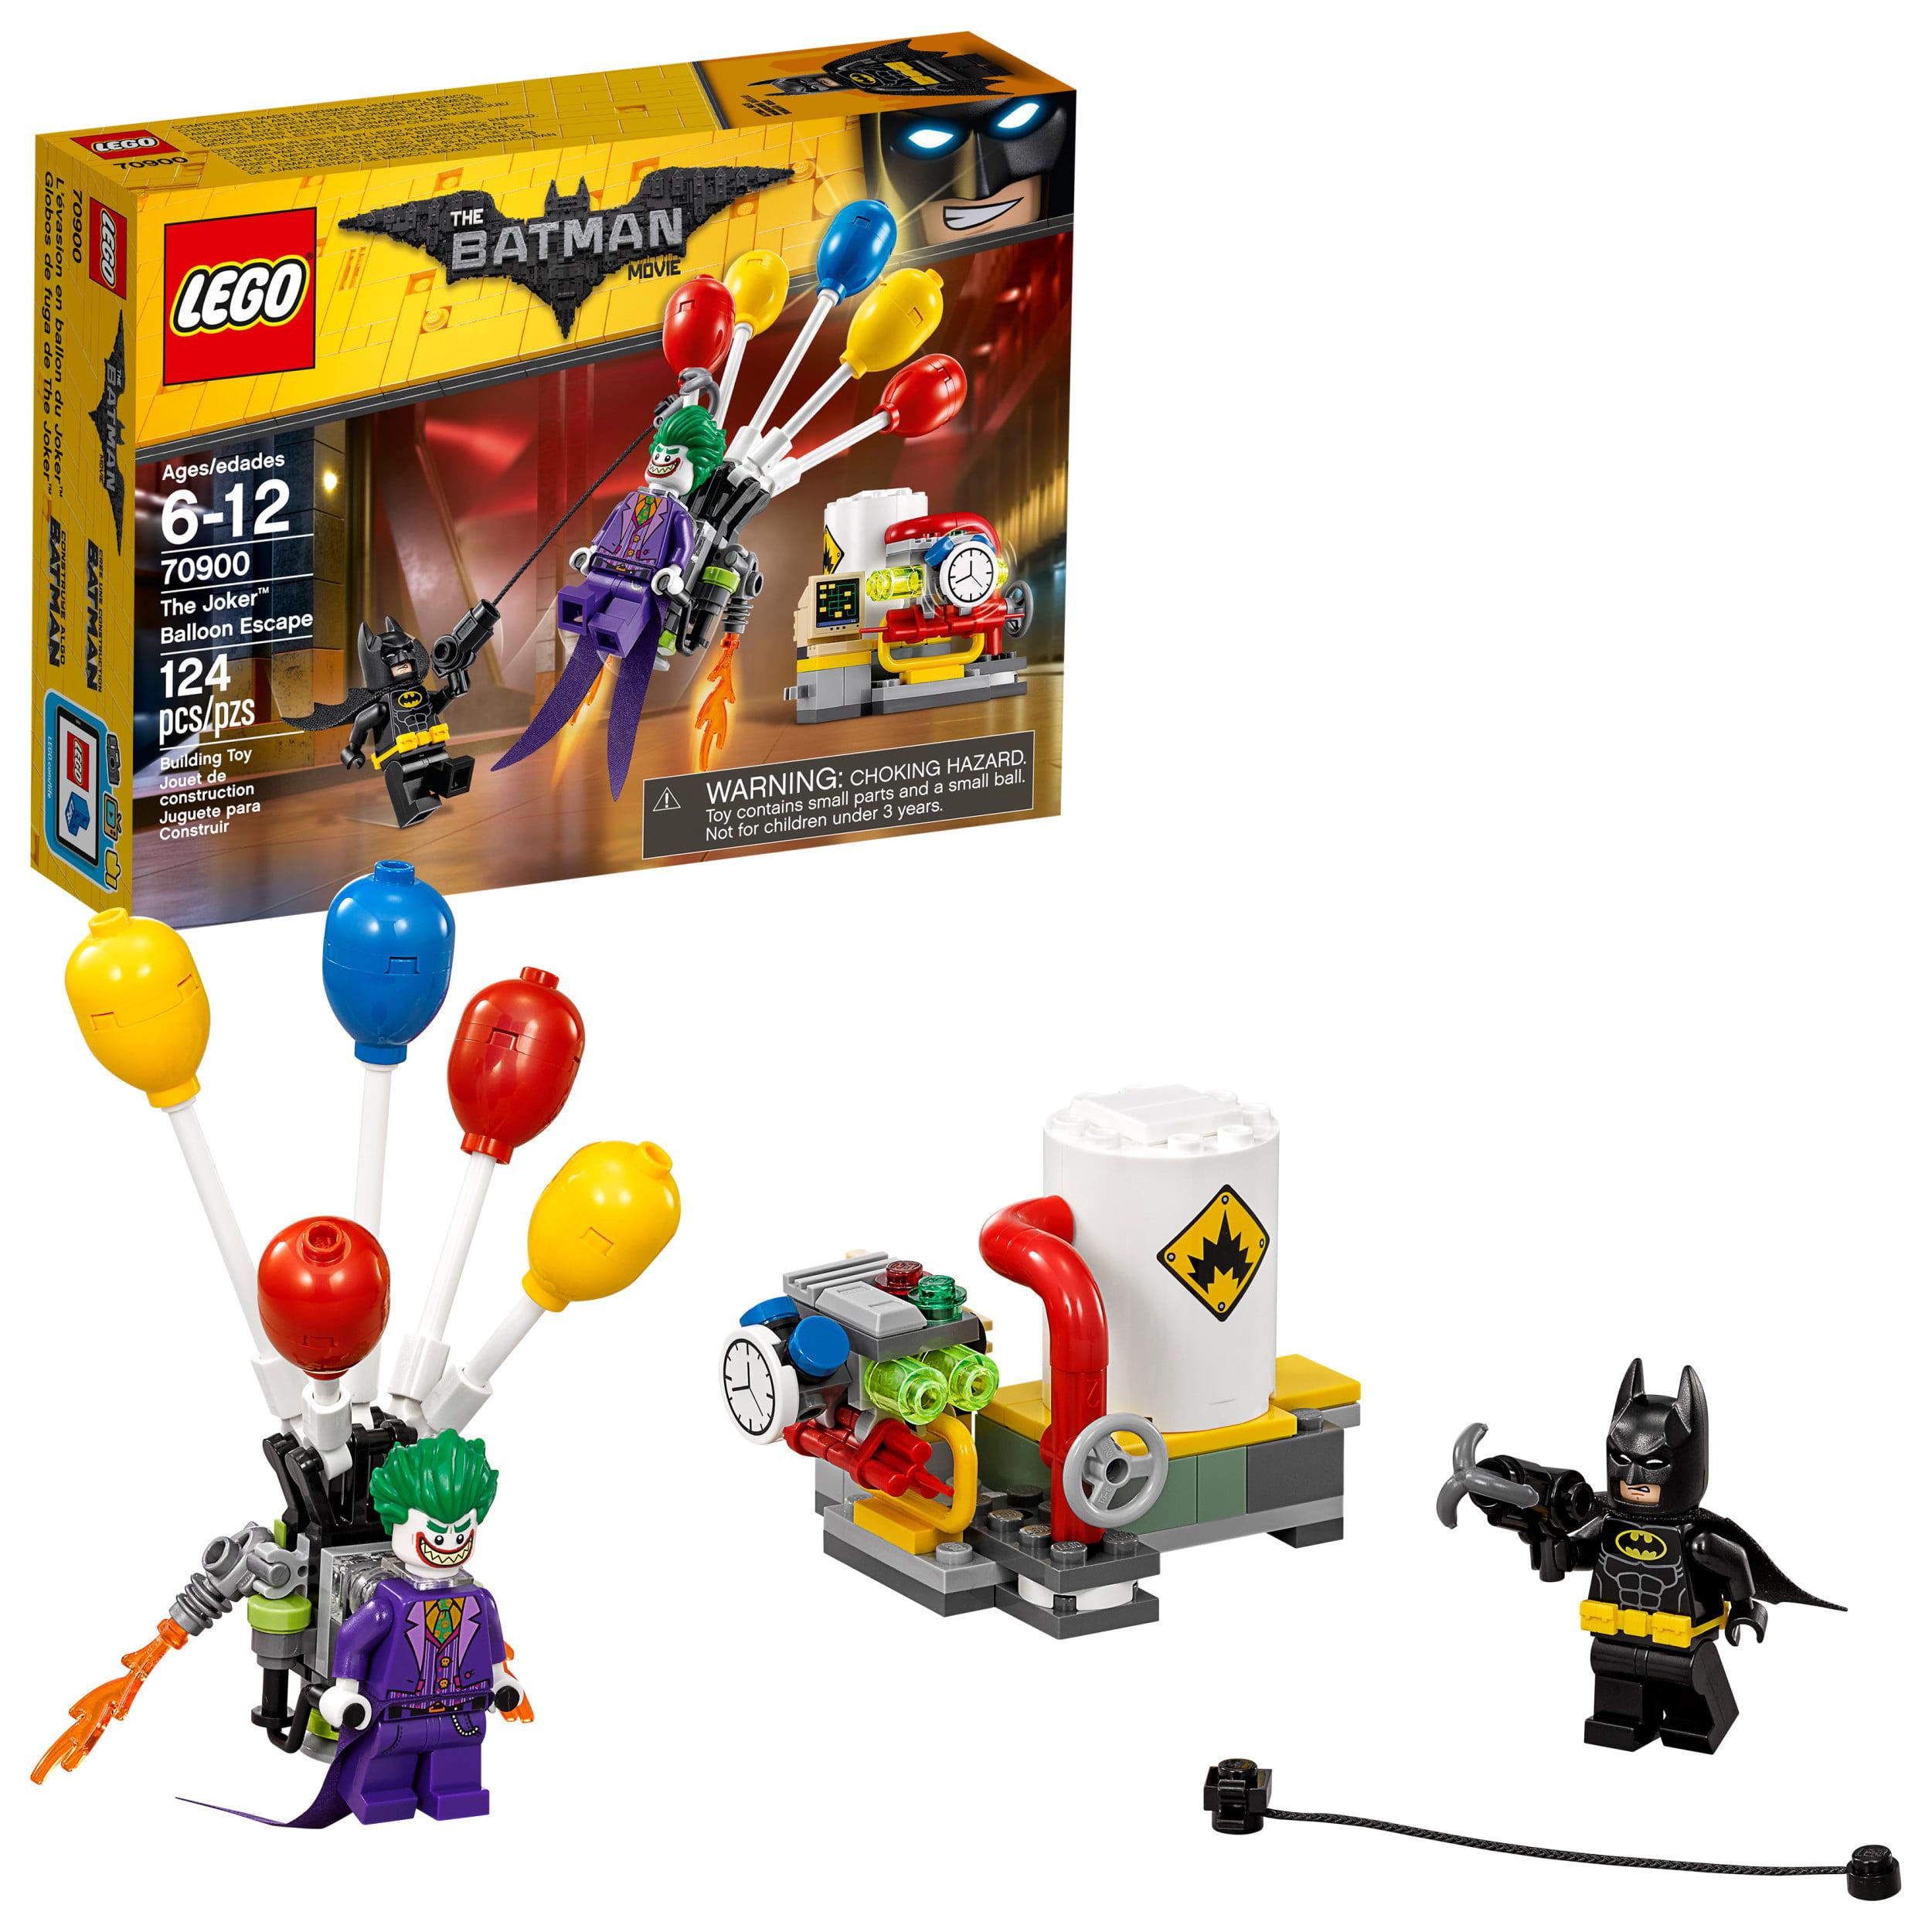 The Lego Batman Movie The Joker Balloon Escape 70900 Walmart Com Walmart Com